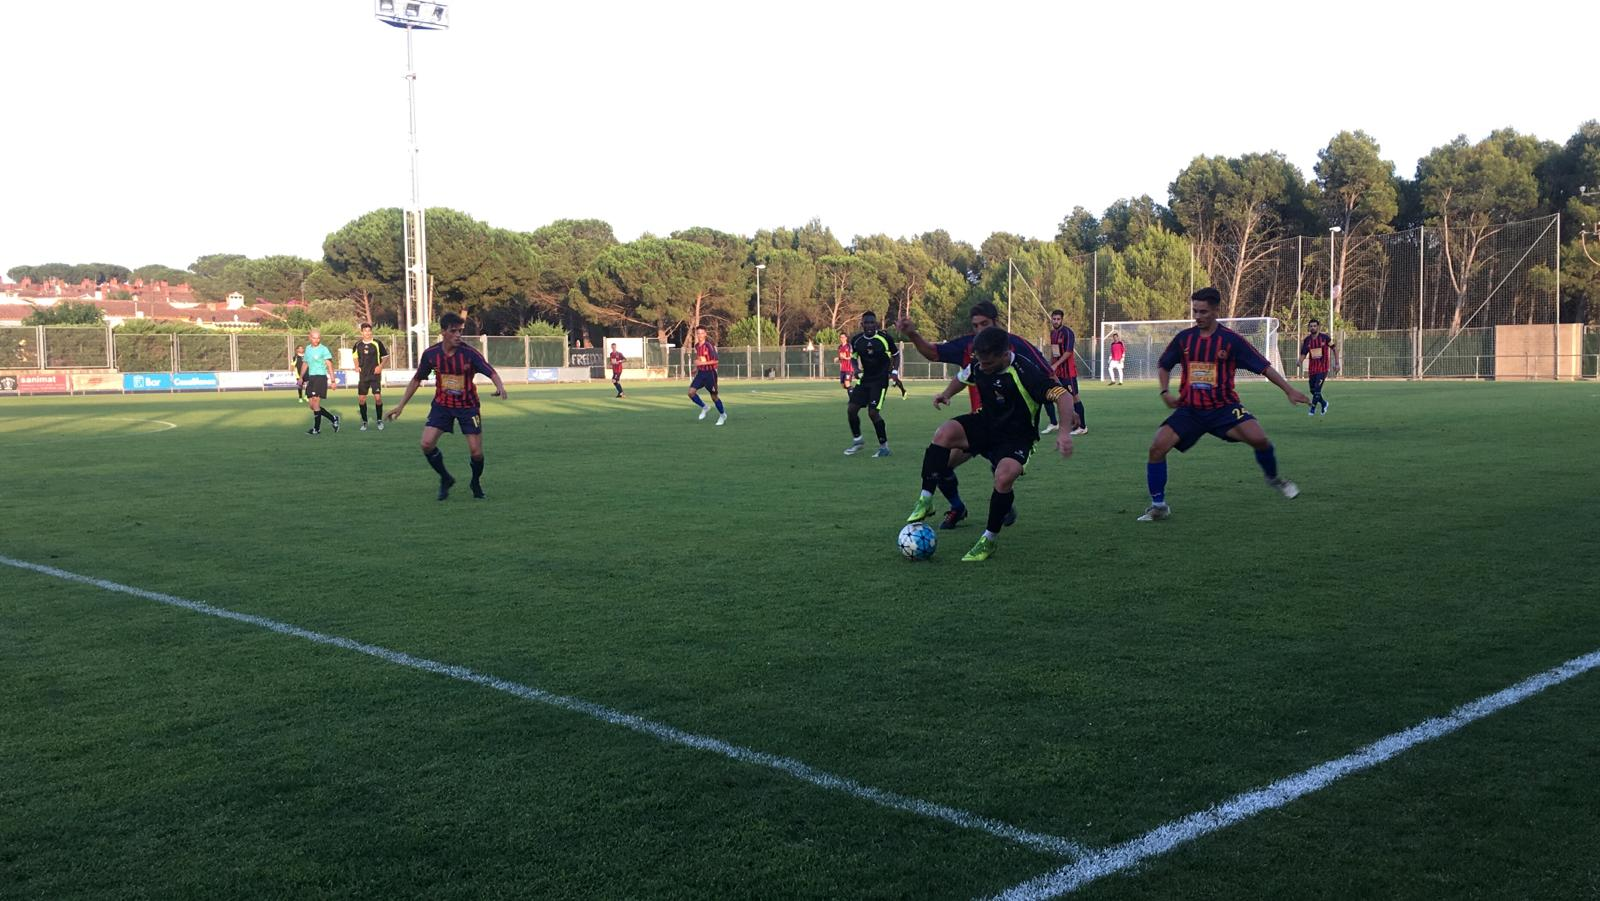 Amistós FC l'Escala-UE Figueres